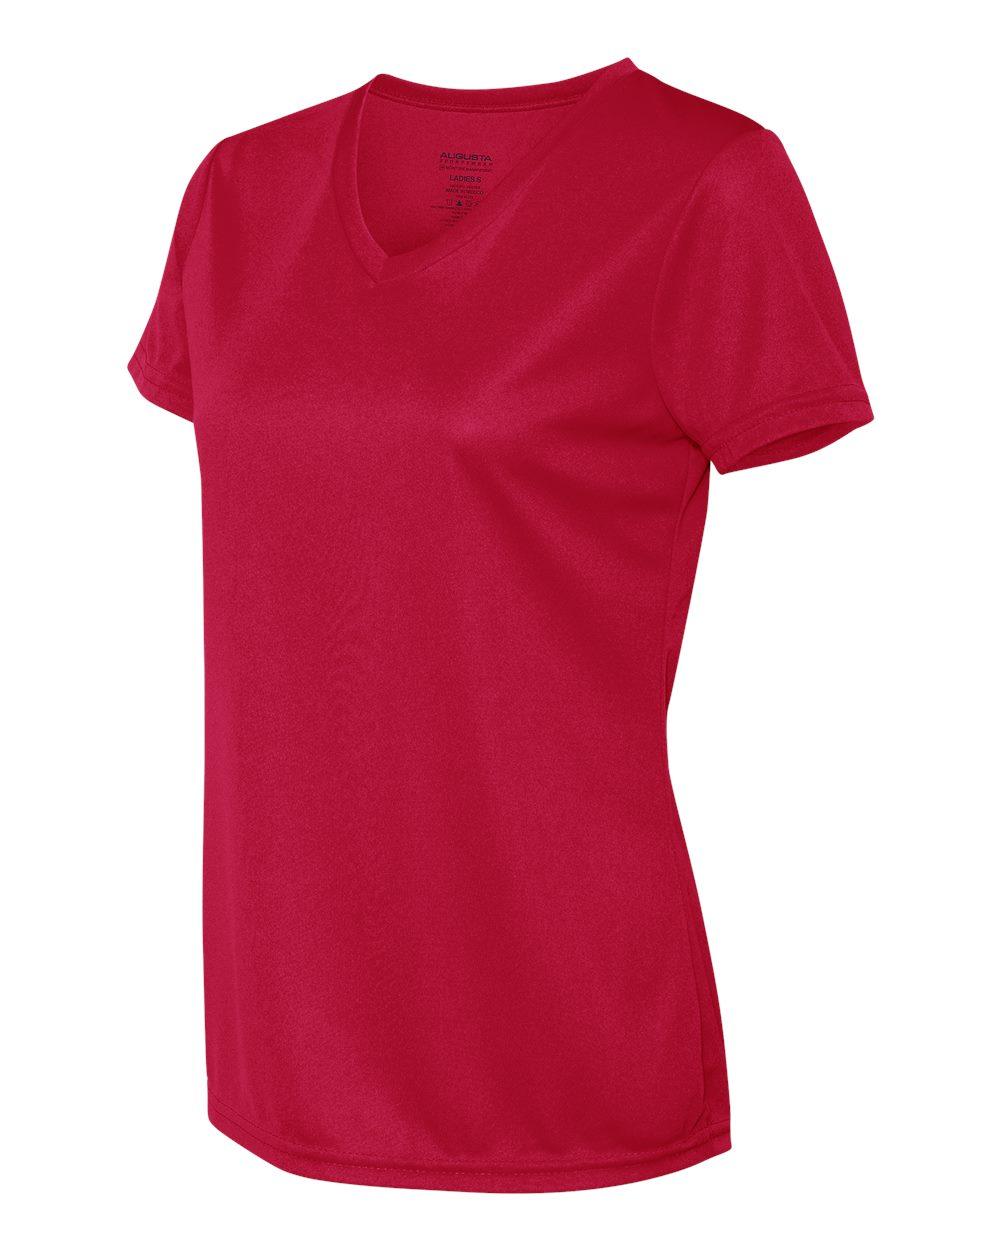 Augusta-Sportswear-Women-039-s-Moisture-Wicking-V-Neck-T-Shirt-1790-XS-2XL thumbnail 27